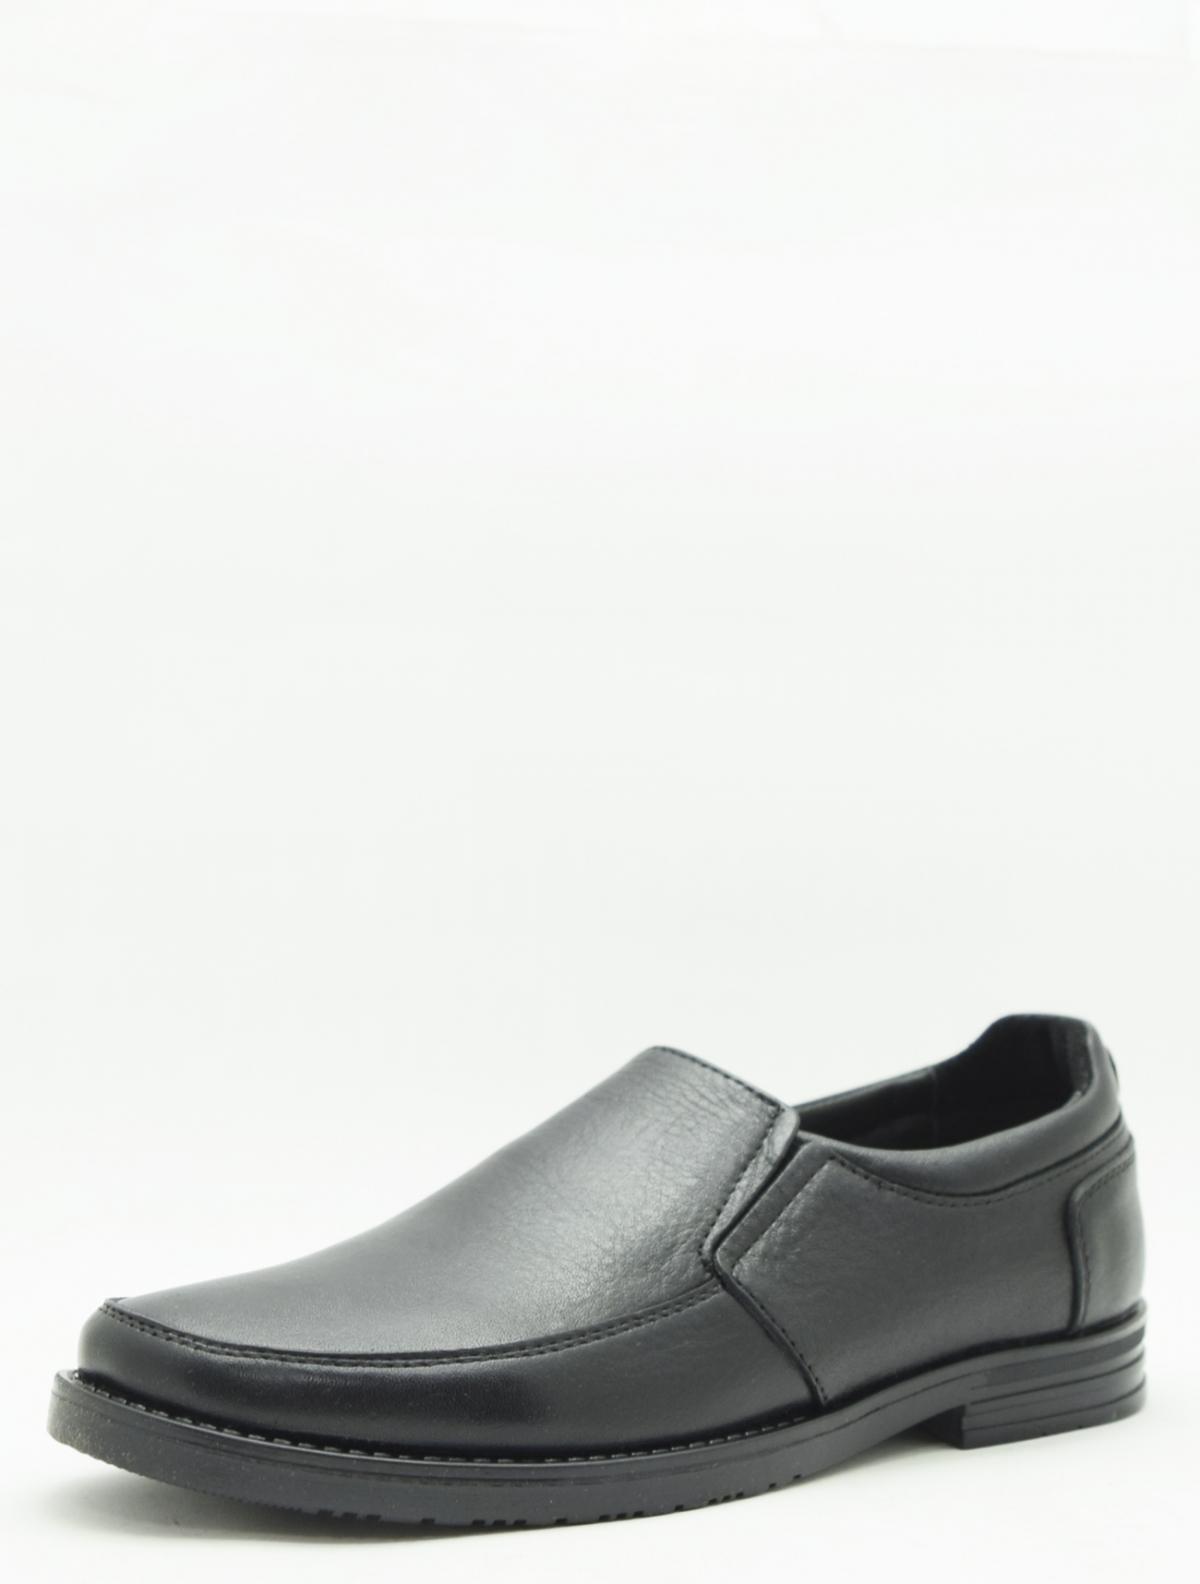 Rooman 802-022-Y1C туфли для мальчика